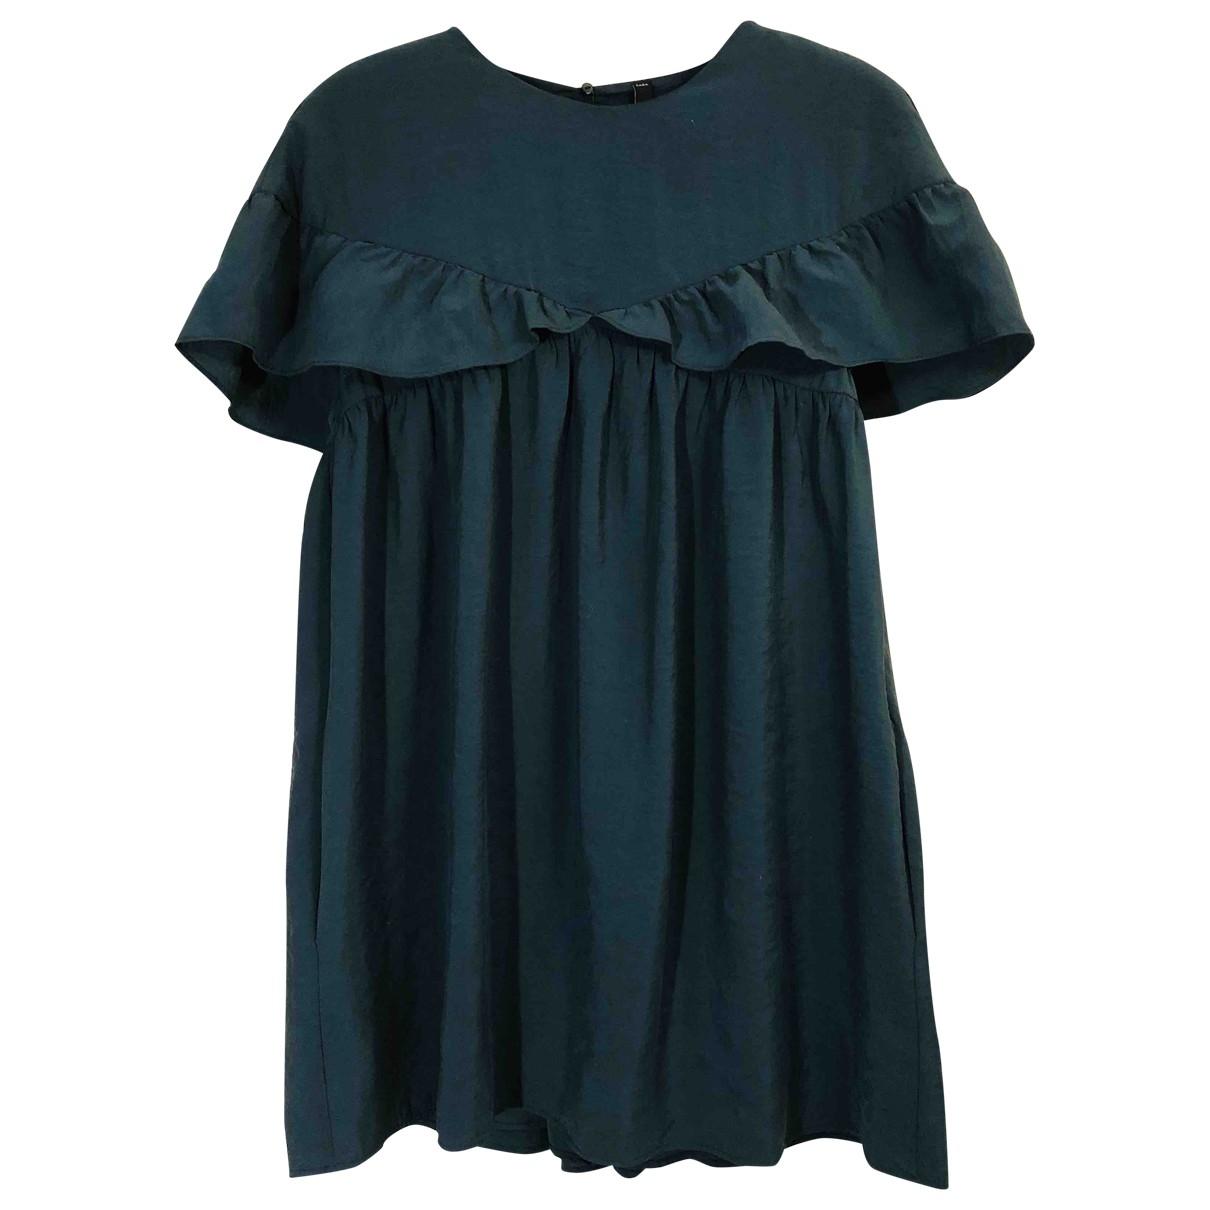 Zara \N Green dress for Women S International